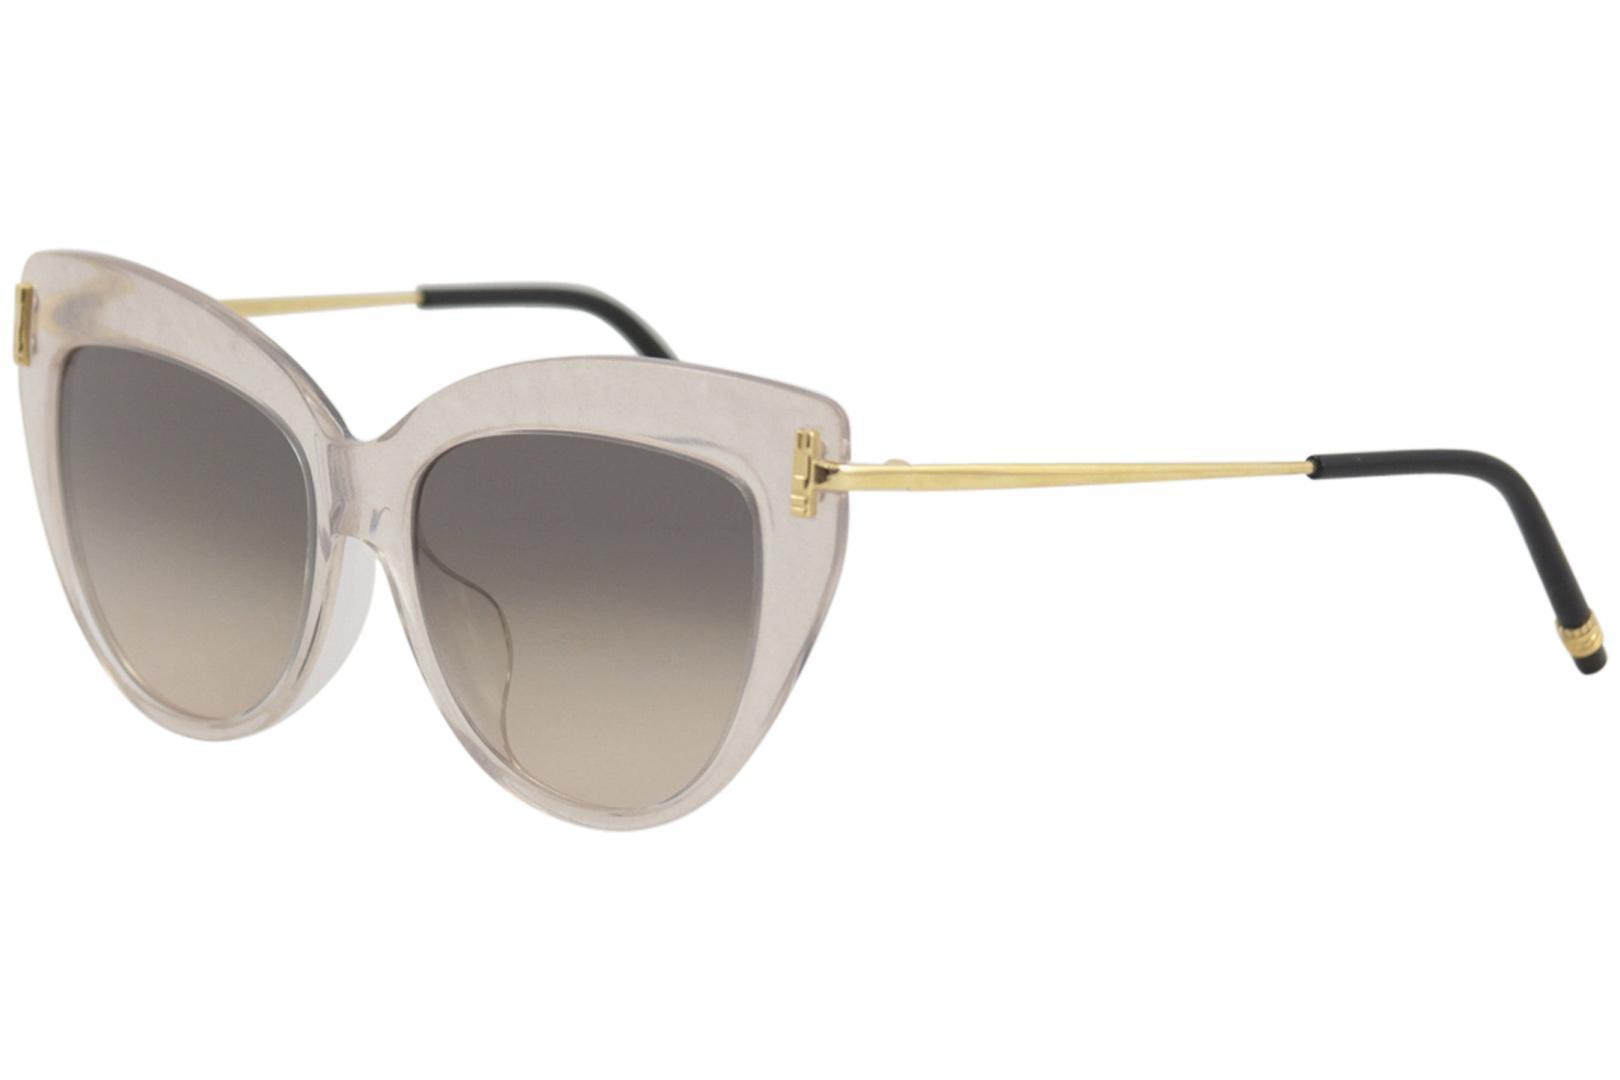 886b9402ce4 Boucheron Women s BC 0016S 0016 S Fashion Cat Eye Sunglasses